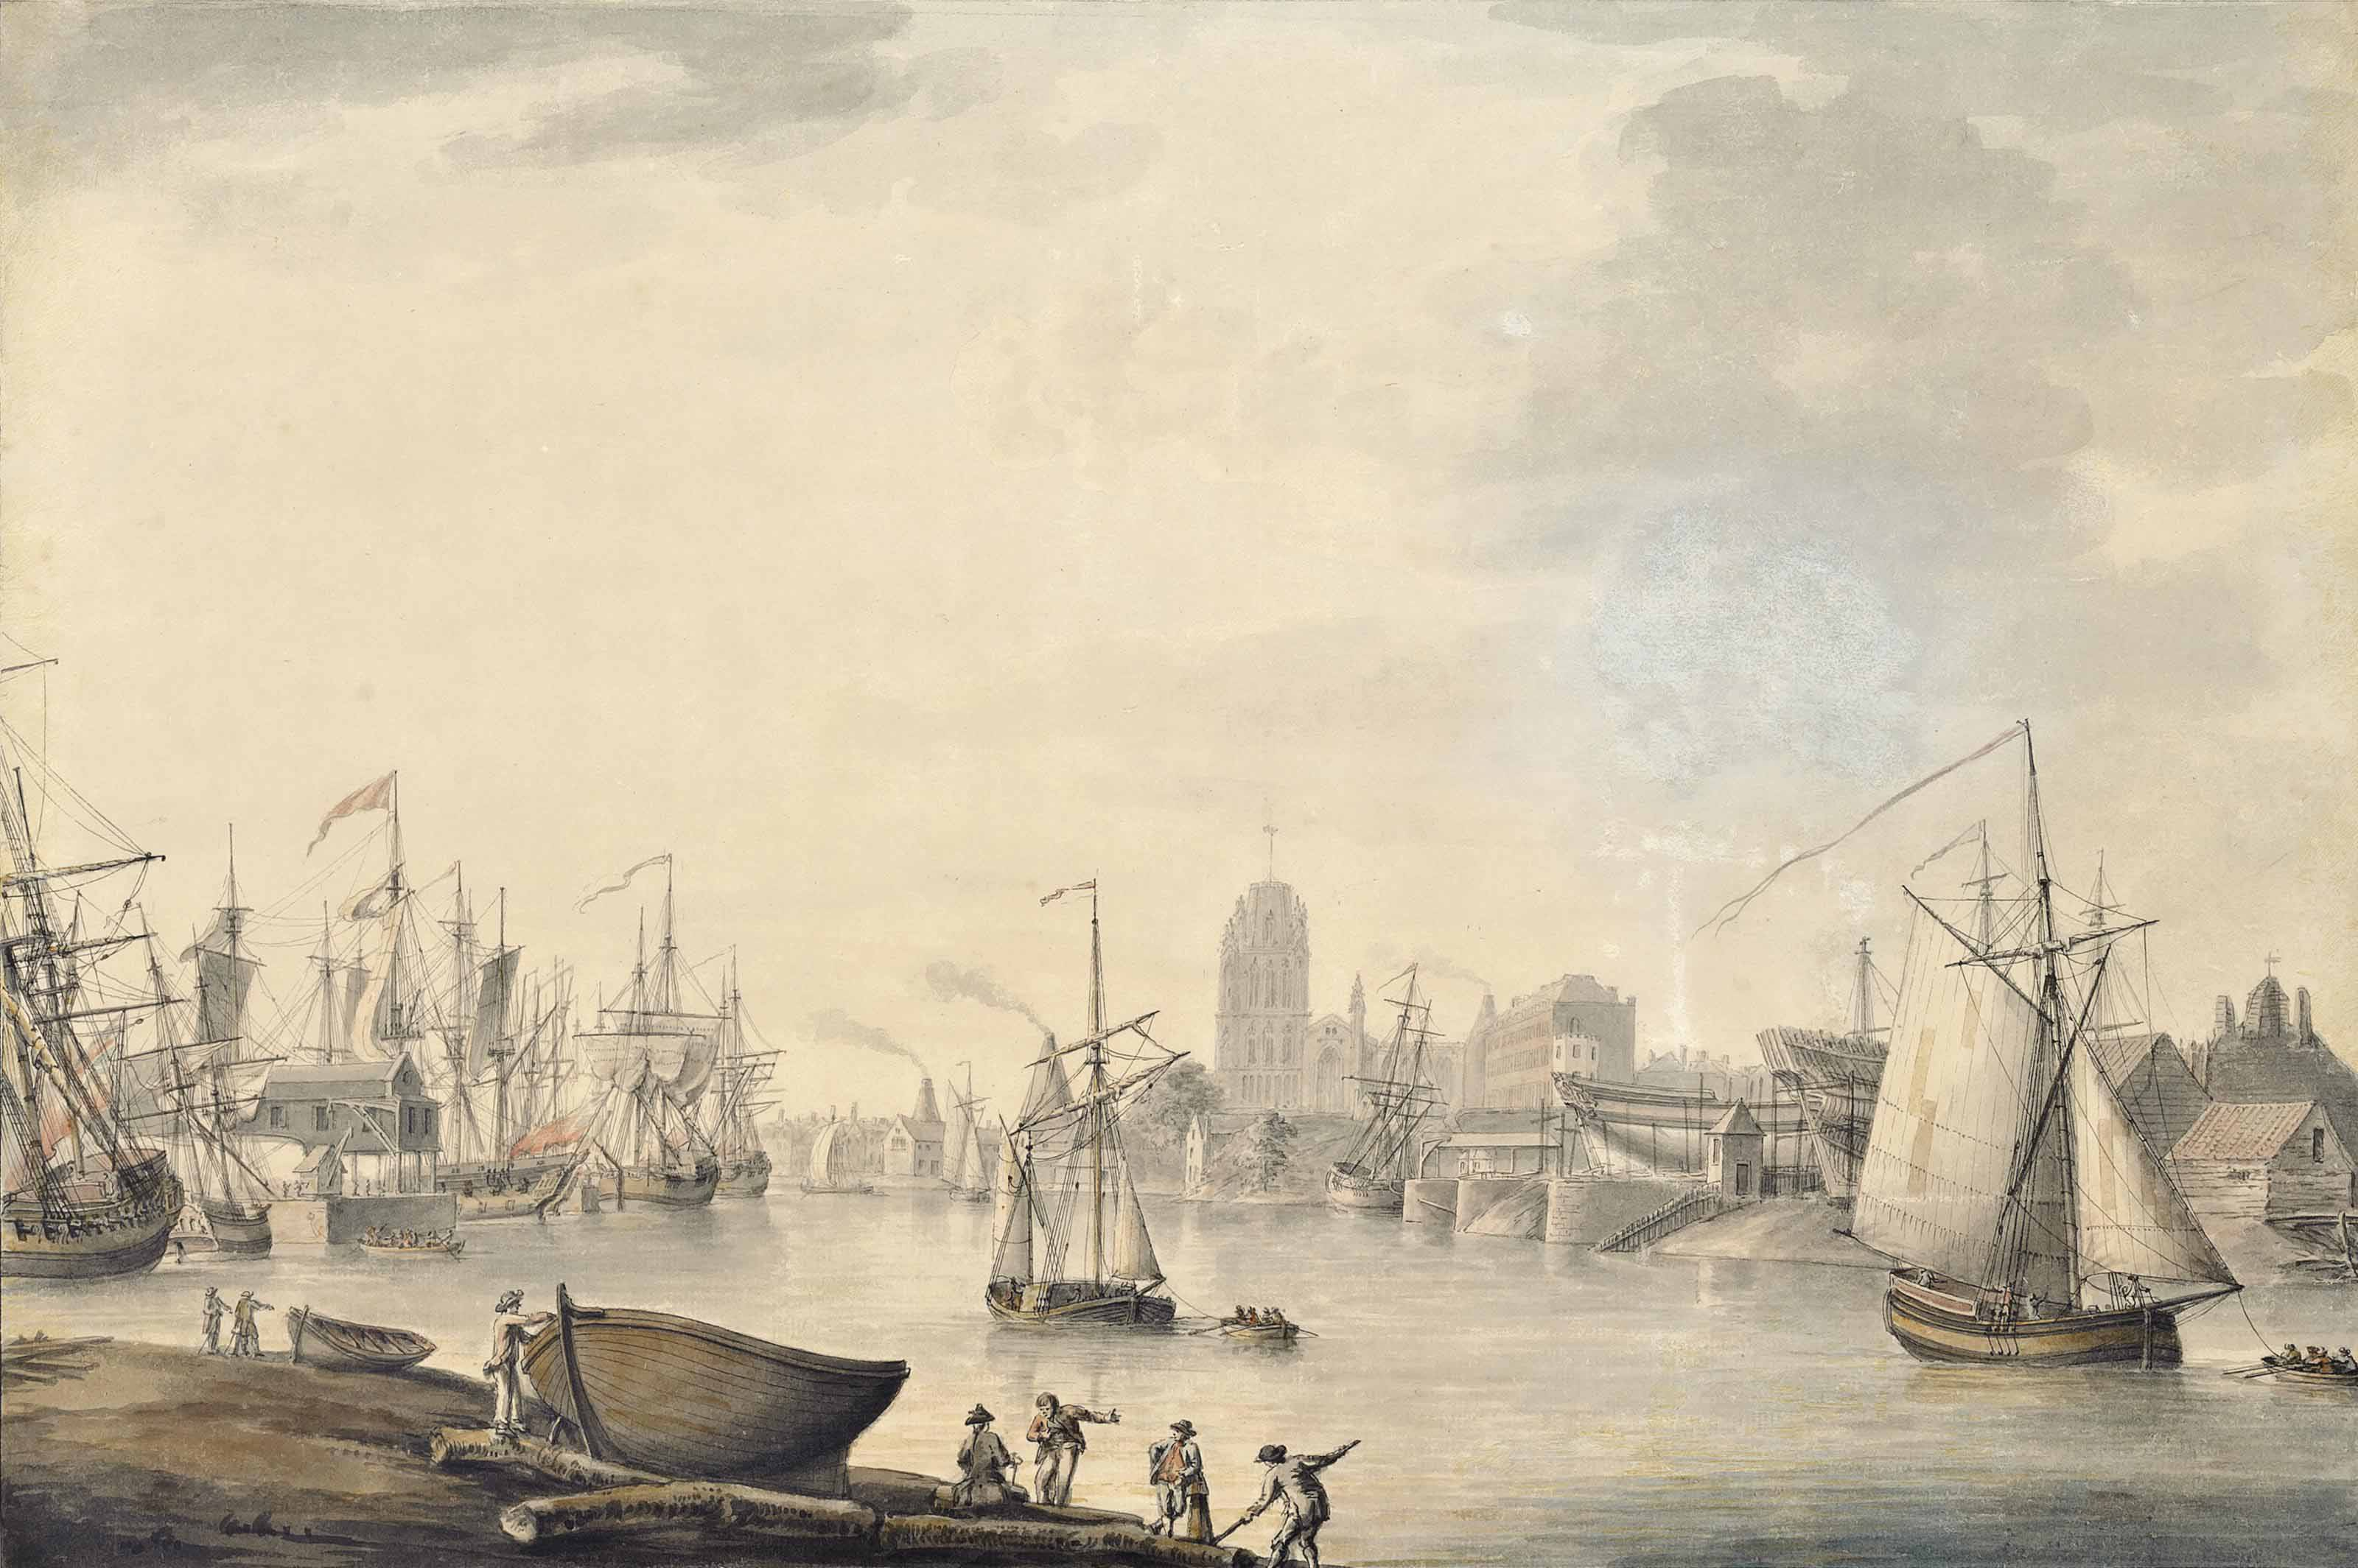 Nicholas Pocock, O.W.S (1740-1821)